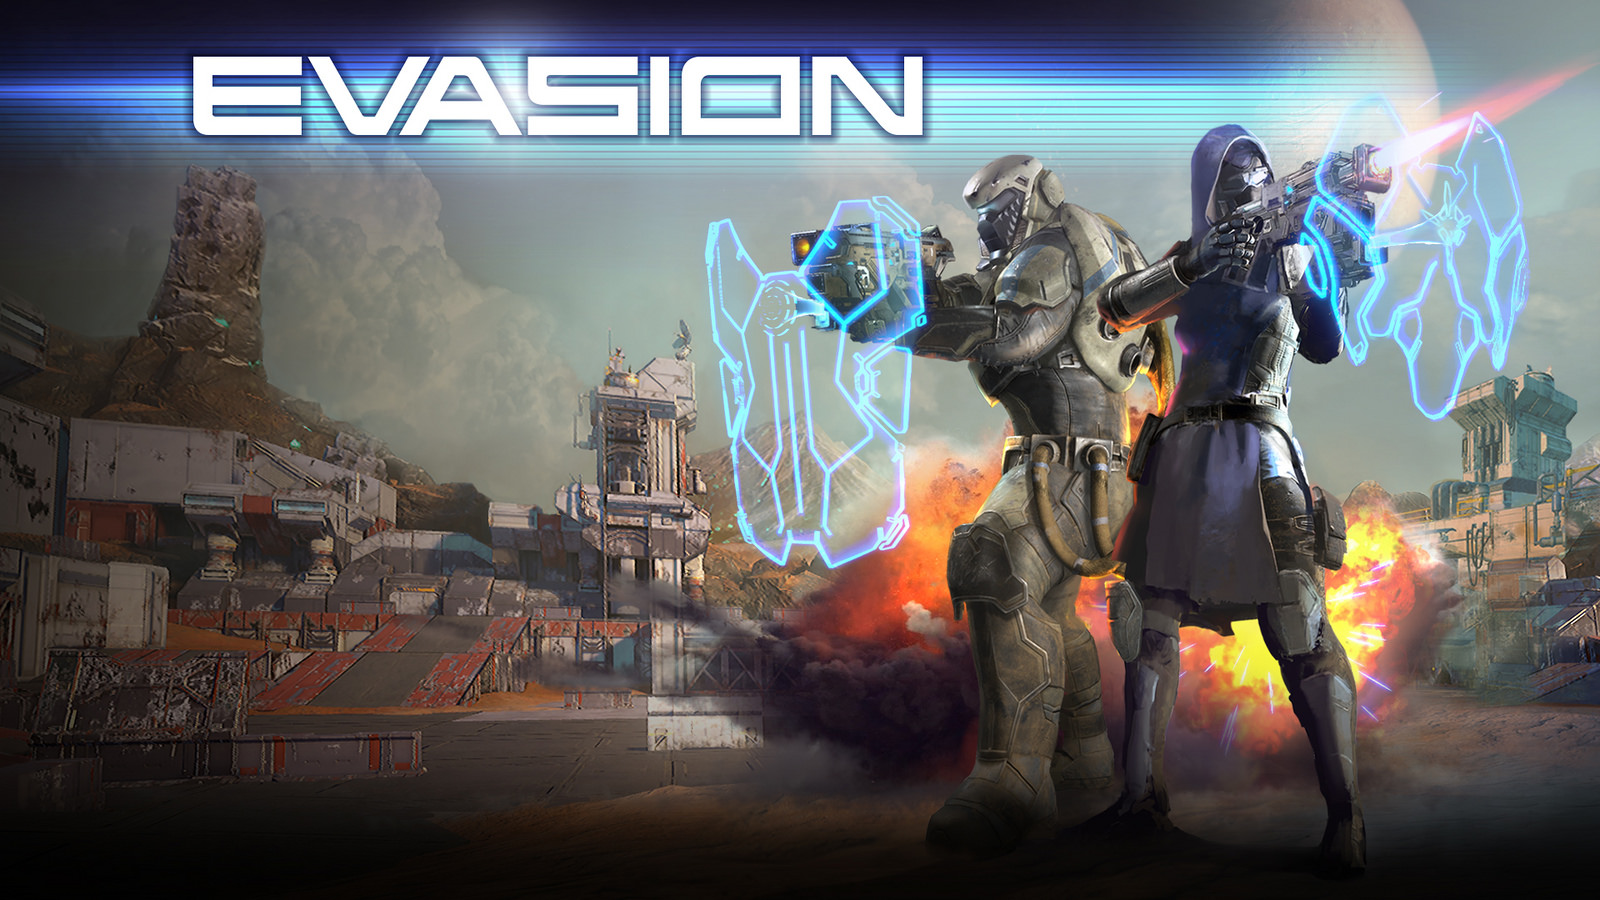 evasion vr game